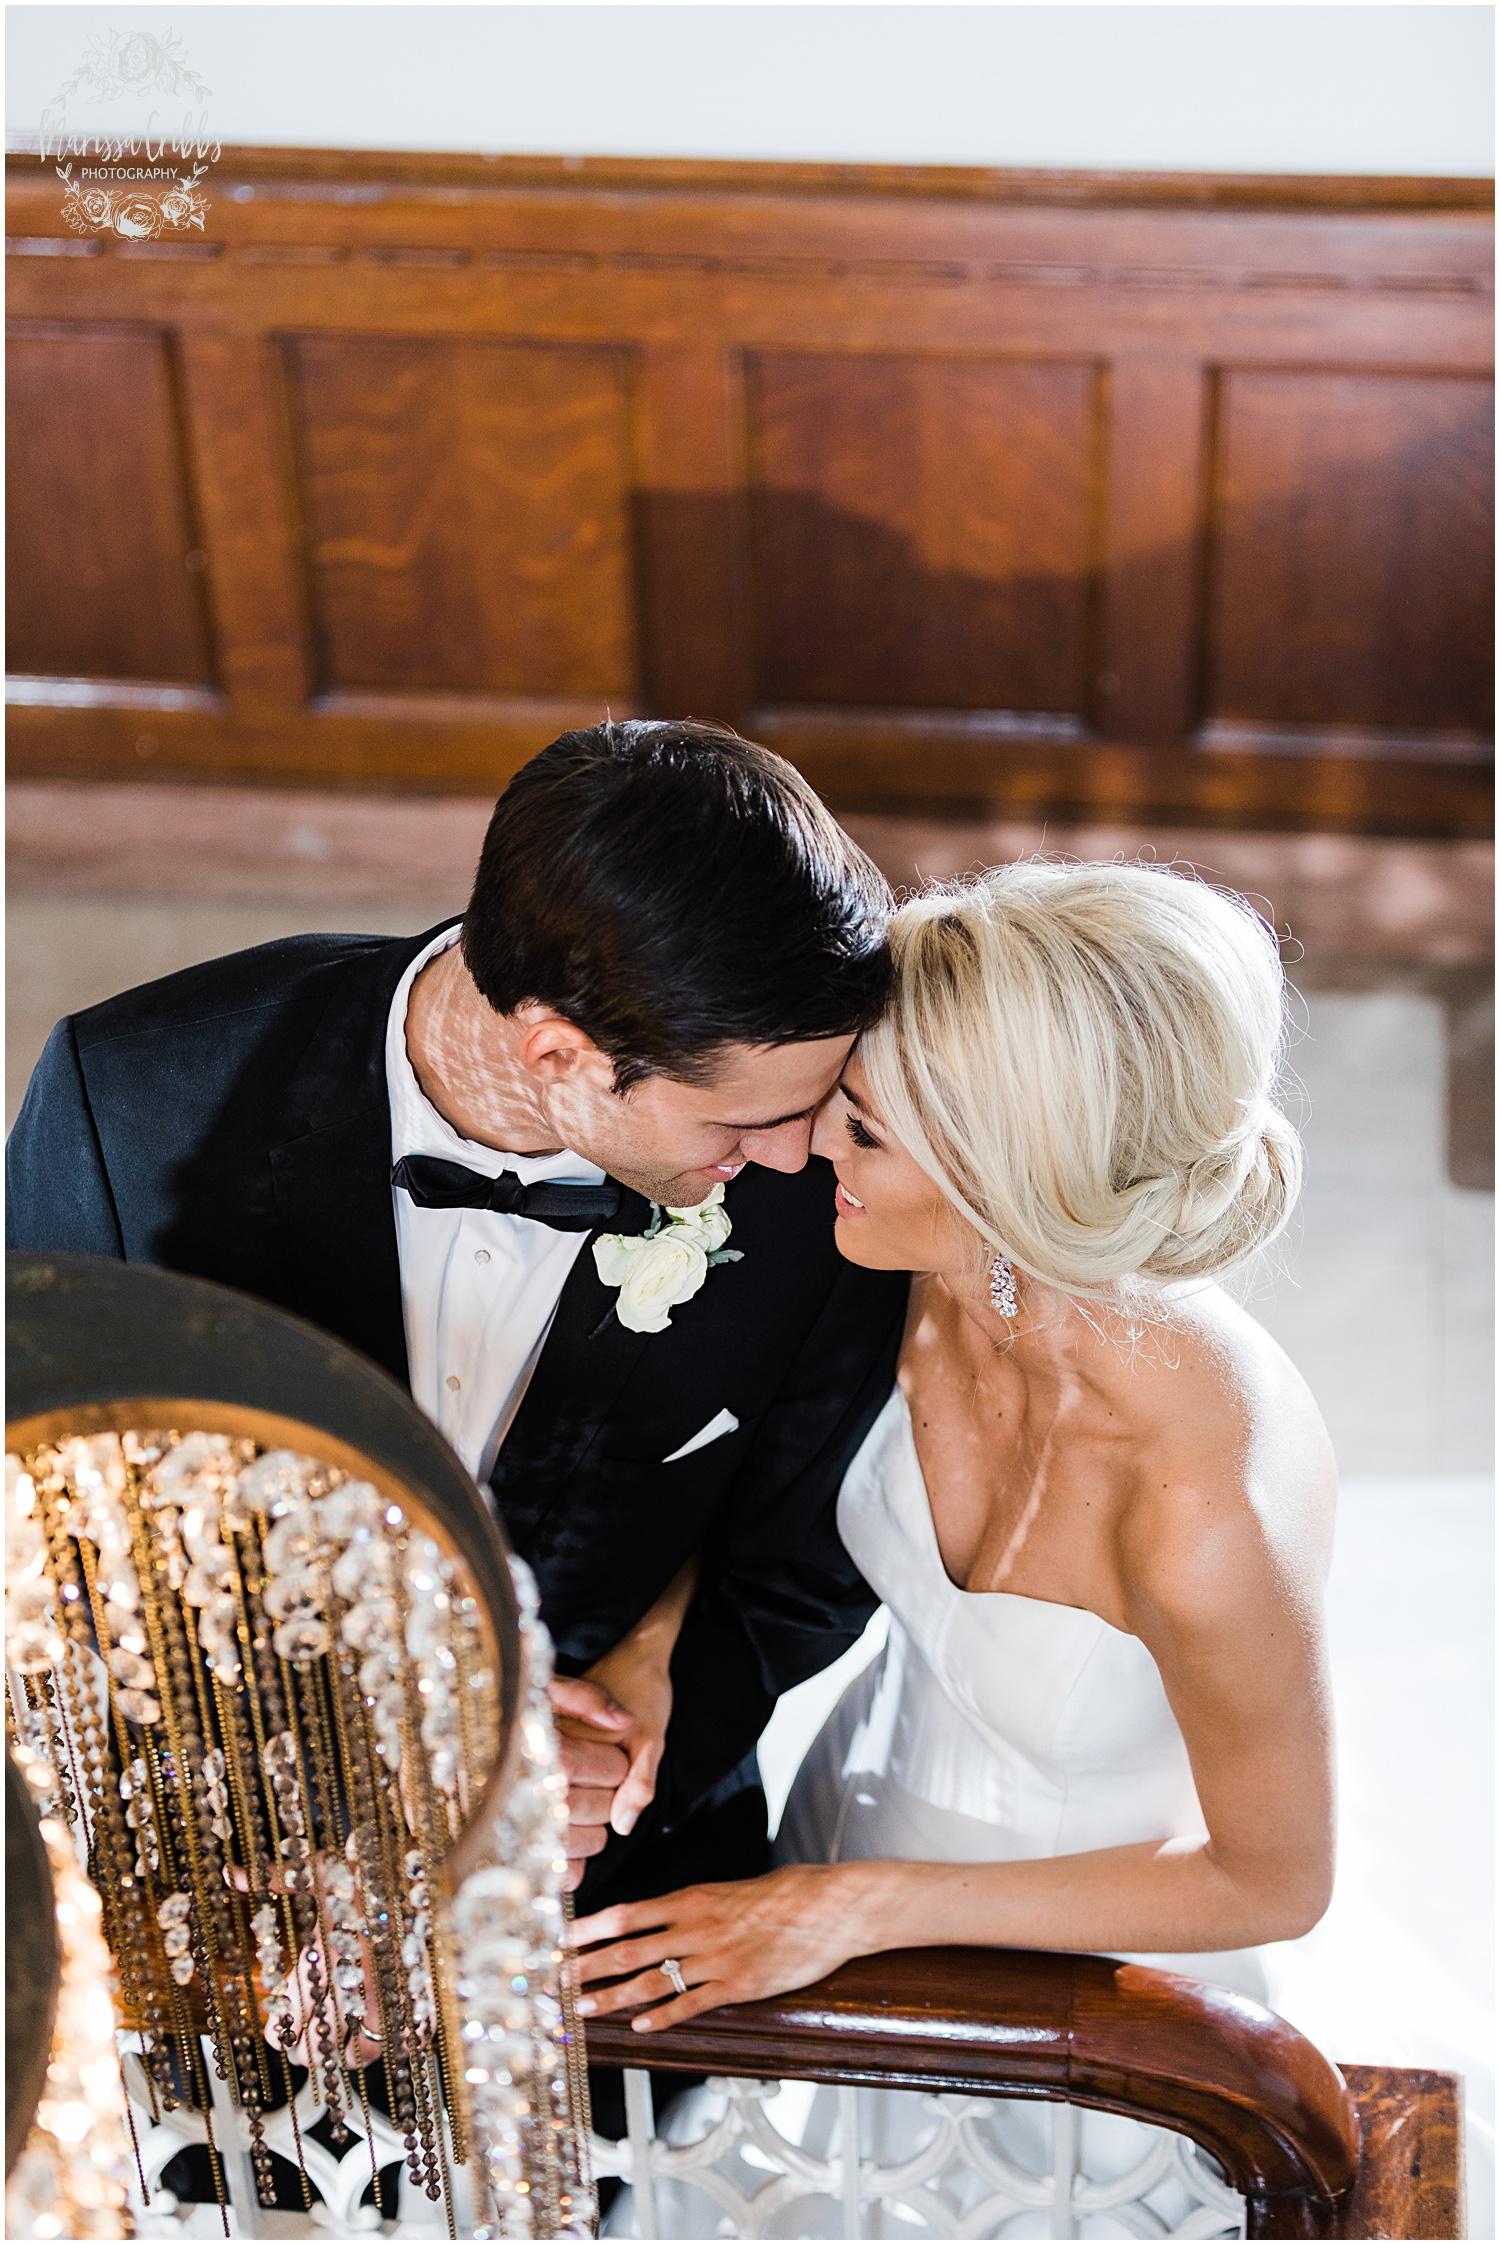 NOLL WEDDING | THE BRASS ON BALTIMORE | MARISSA CRIBBS PHOTOGRAPHY_6346.jpg